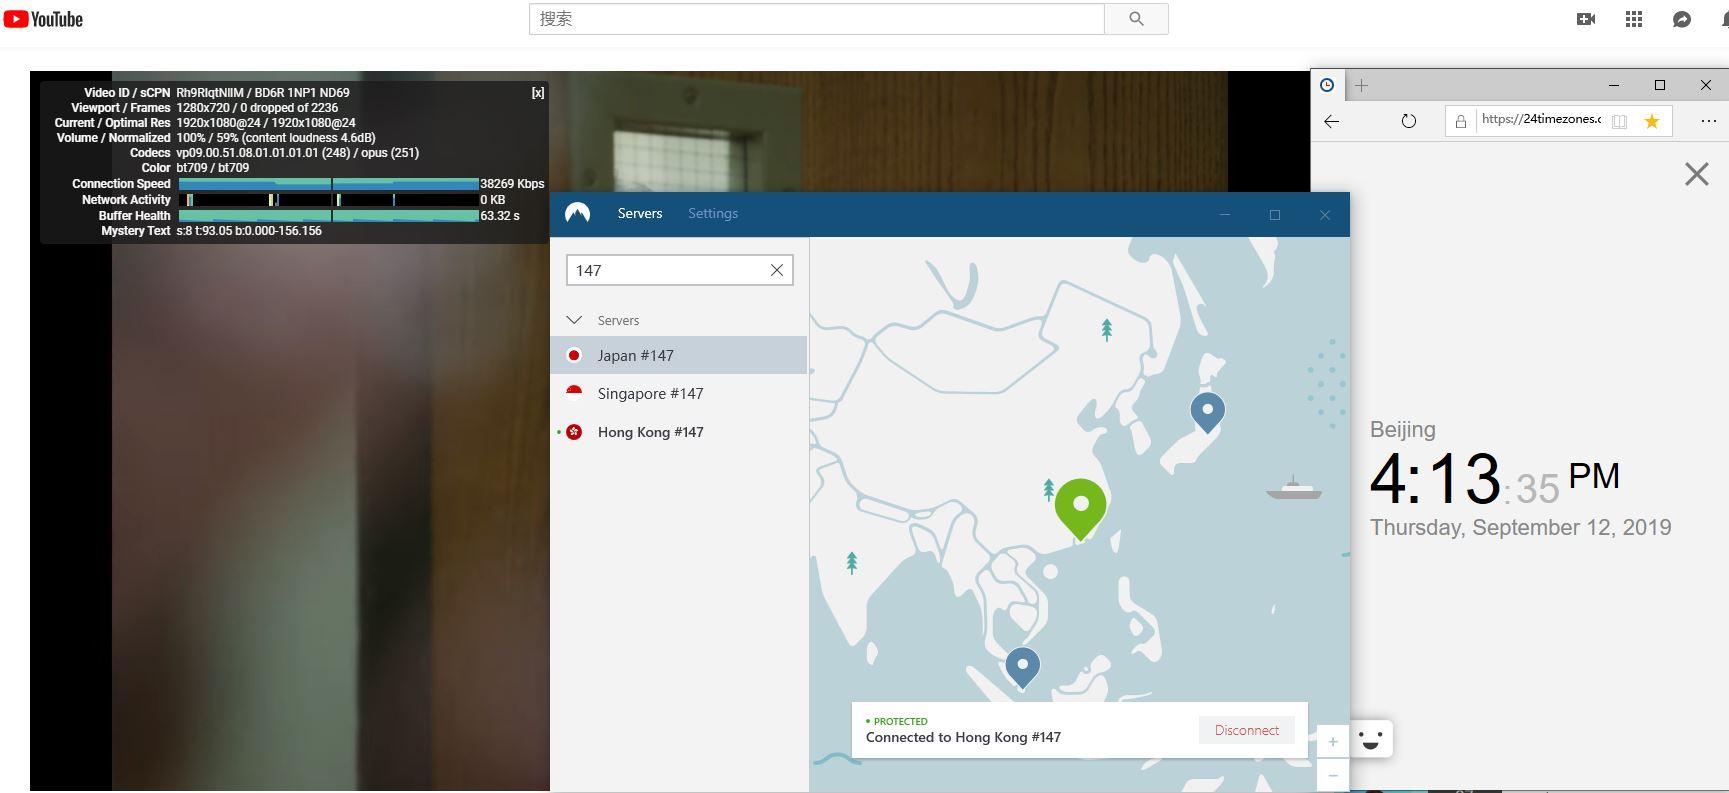 window10 NordVPN Hong Kong 147 服务器 中国VPN翻墙 科学上网-20190912